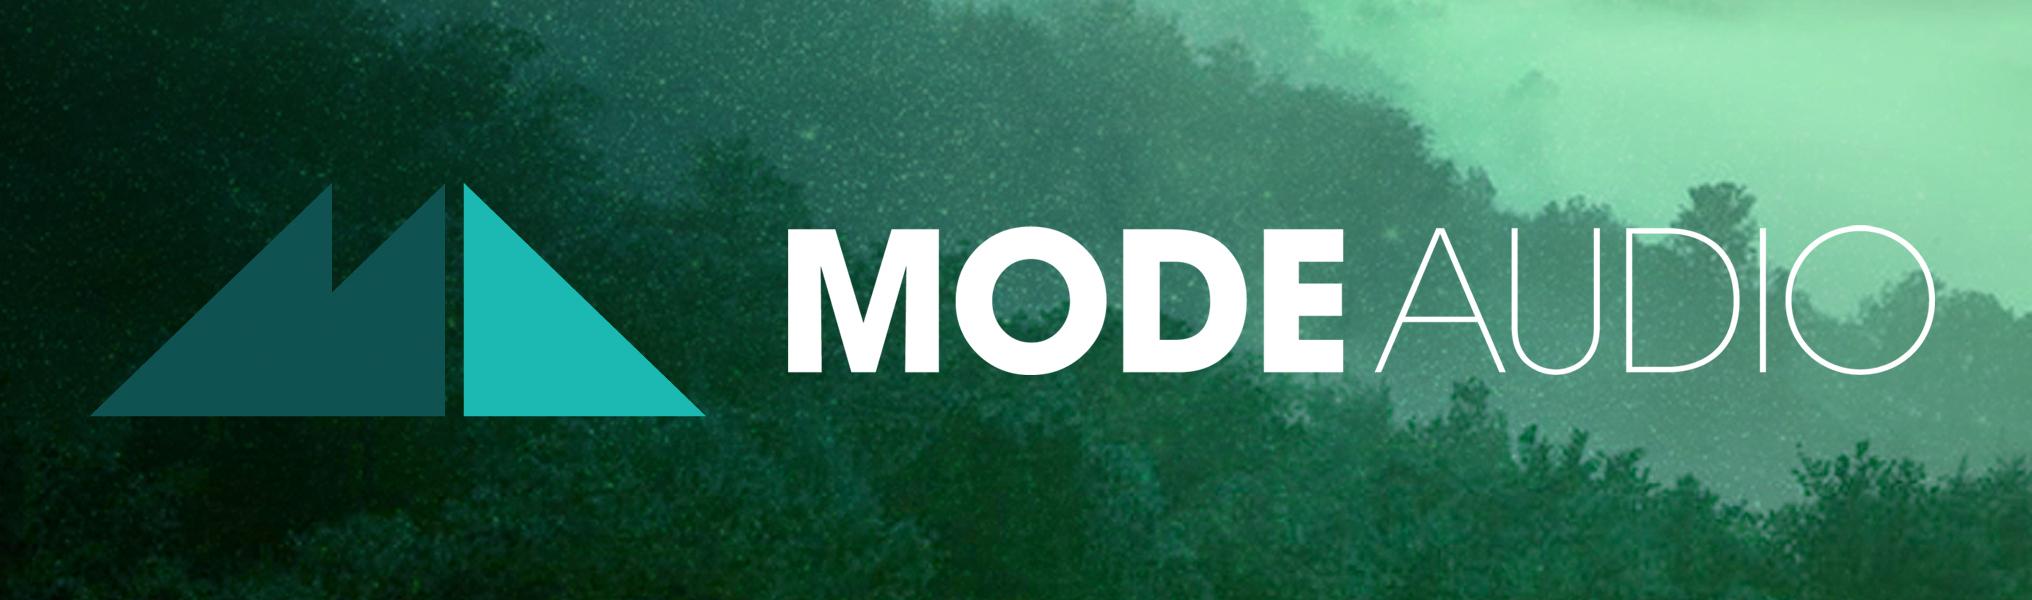 modeaudio_banner